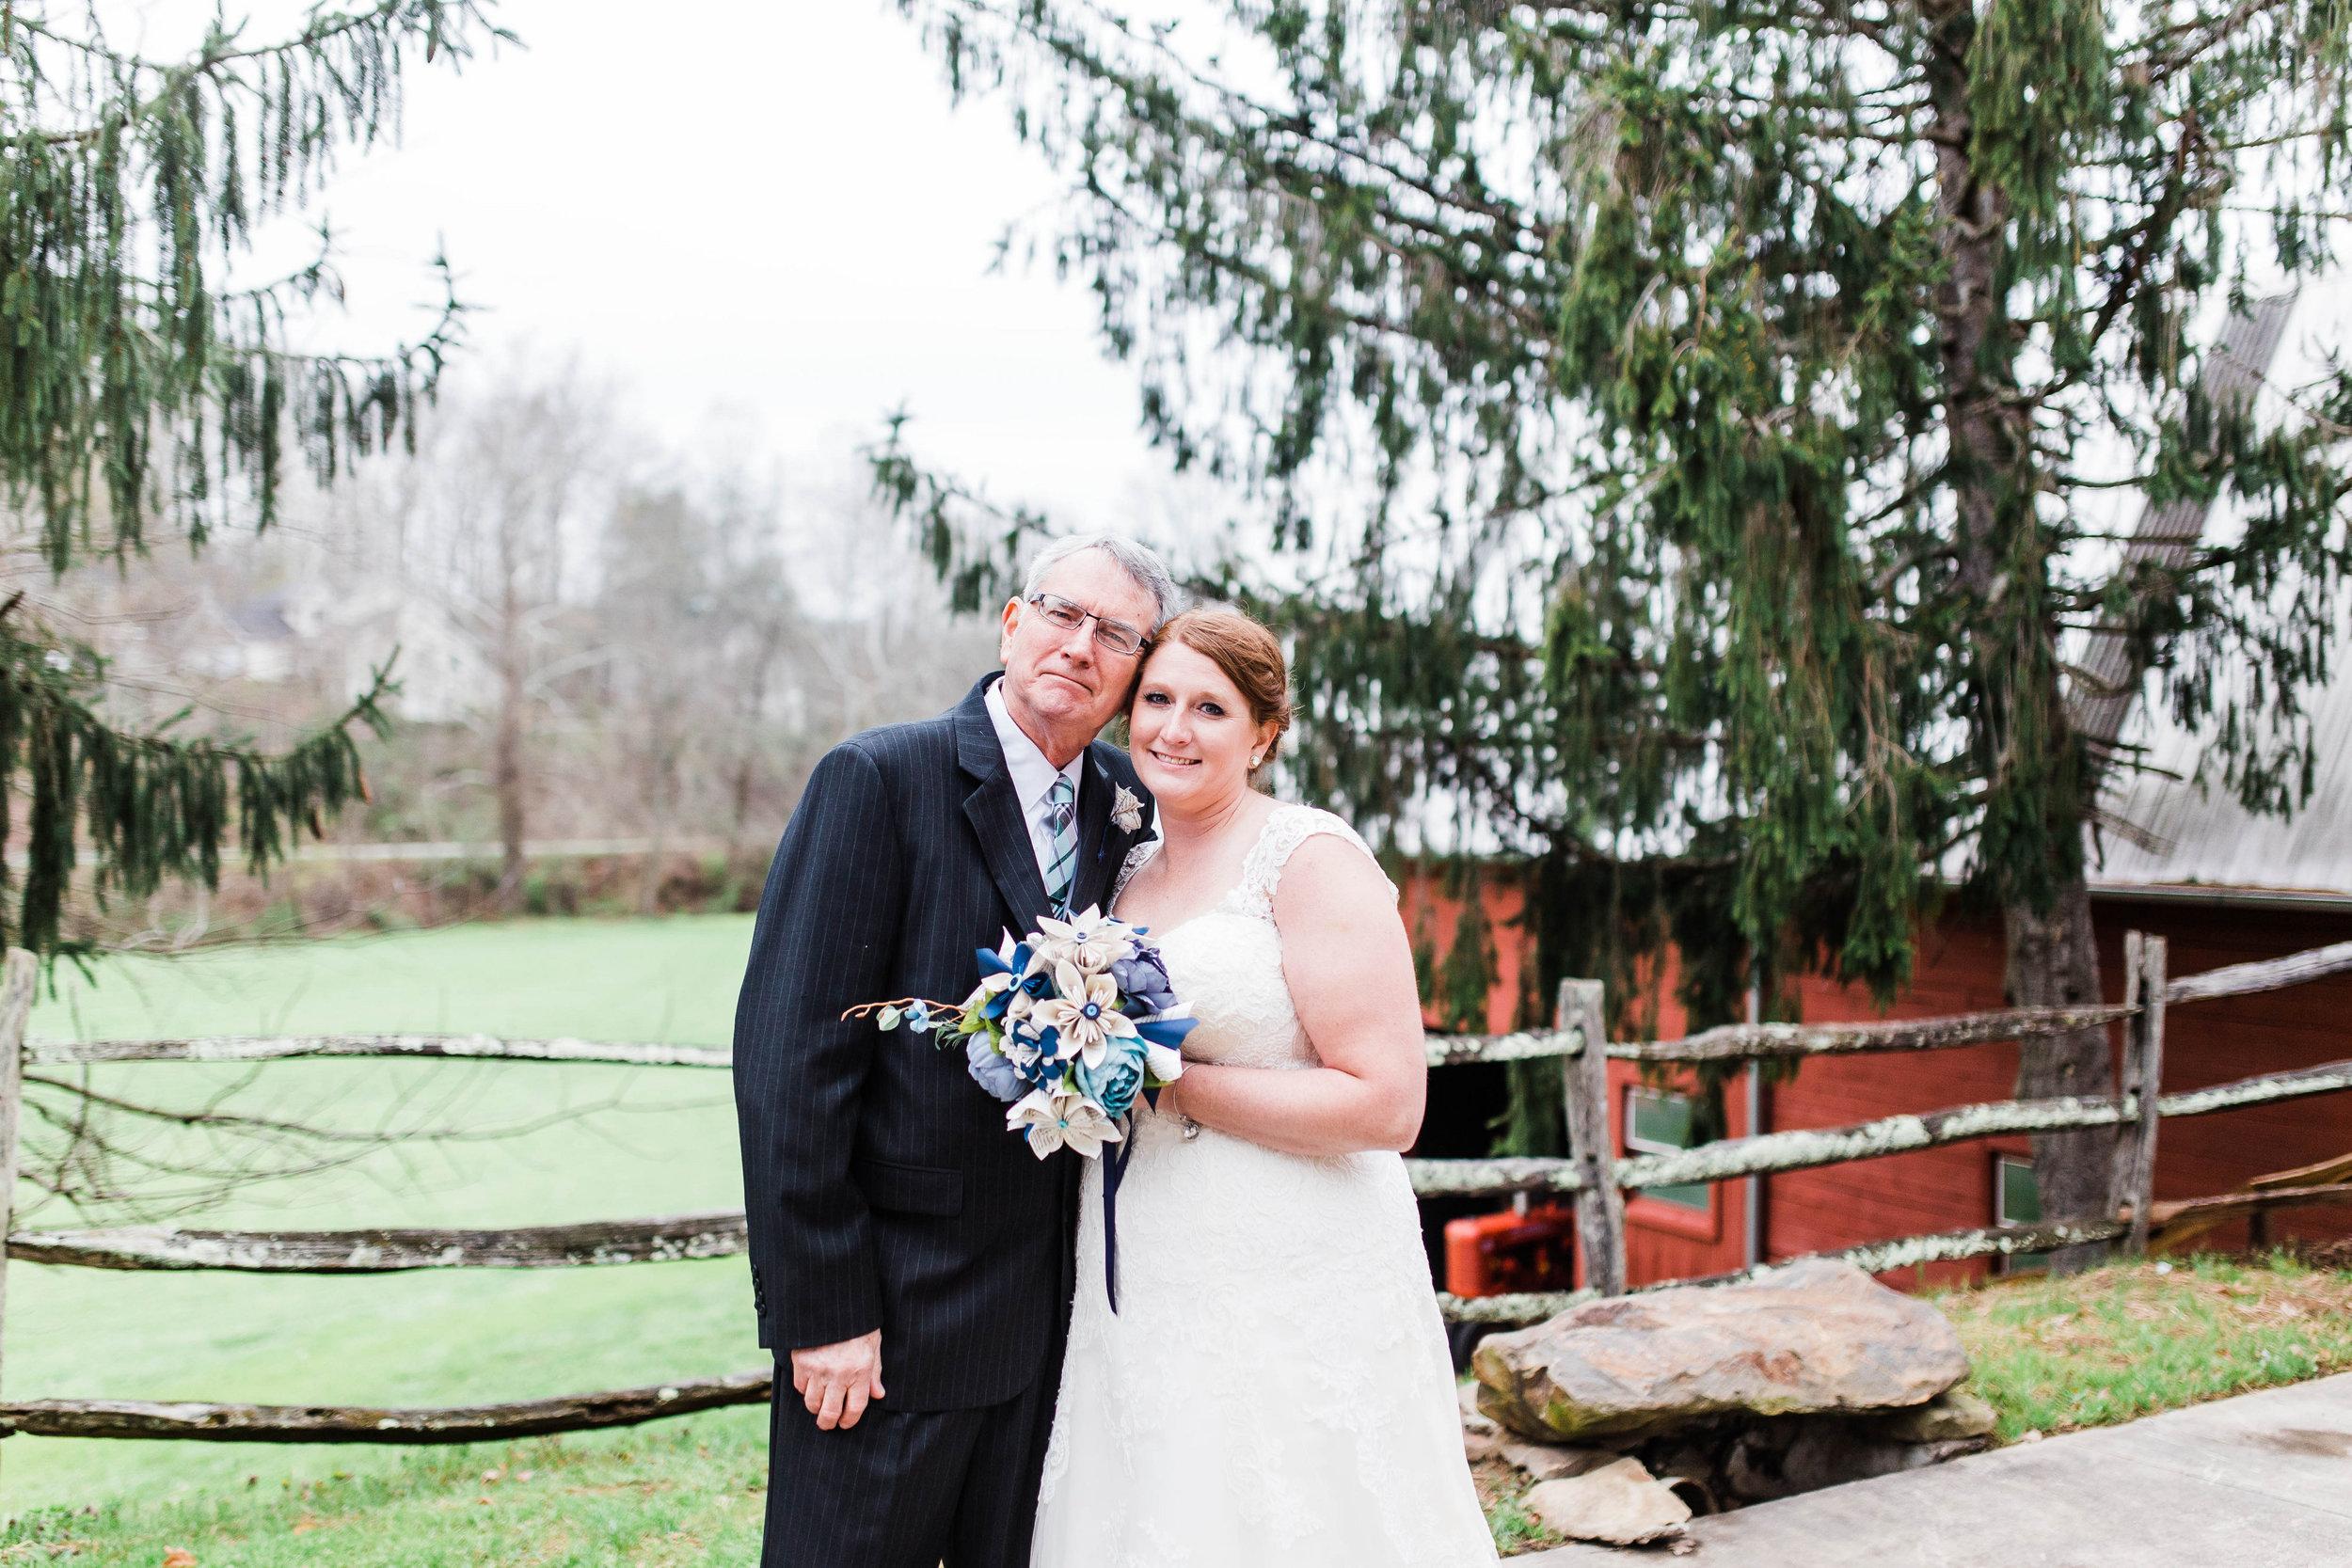 Honeysuckle-Hill-Weddings-Andrew-Rachel-60.jpg